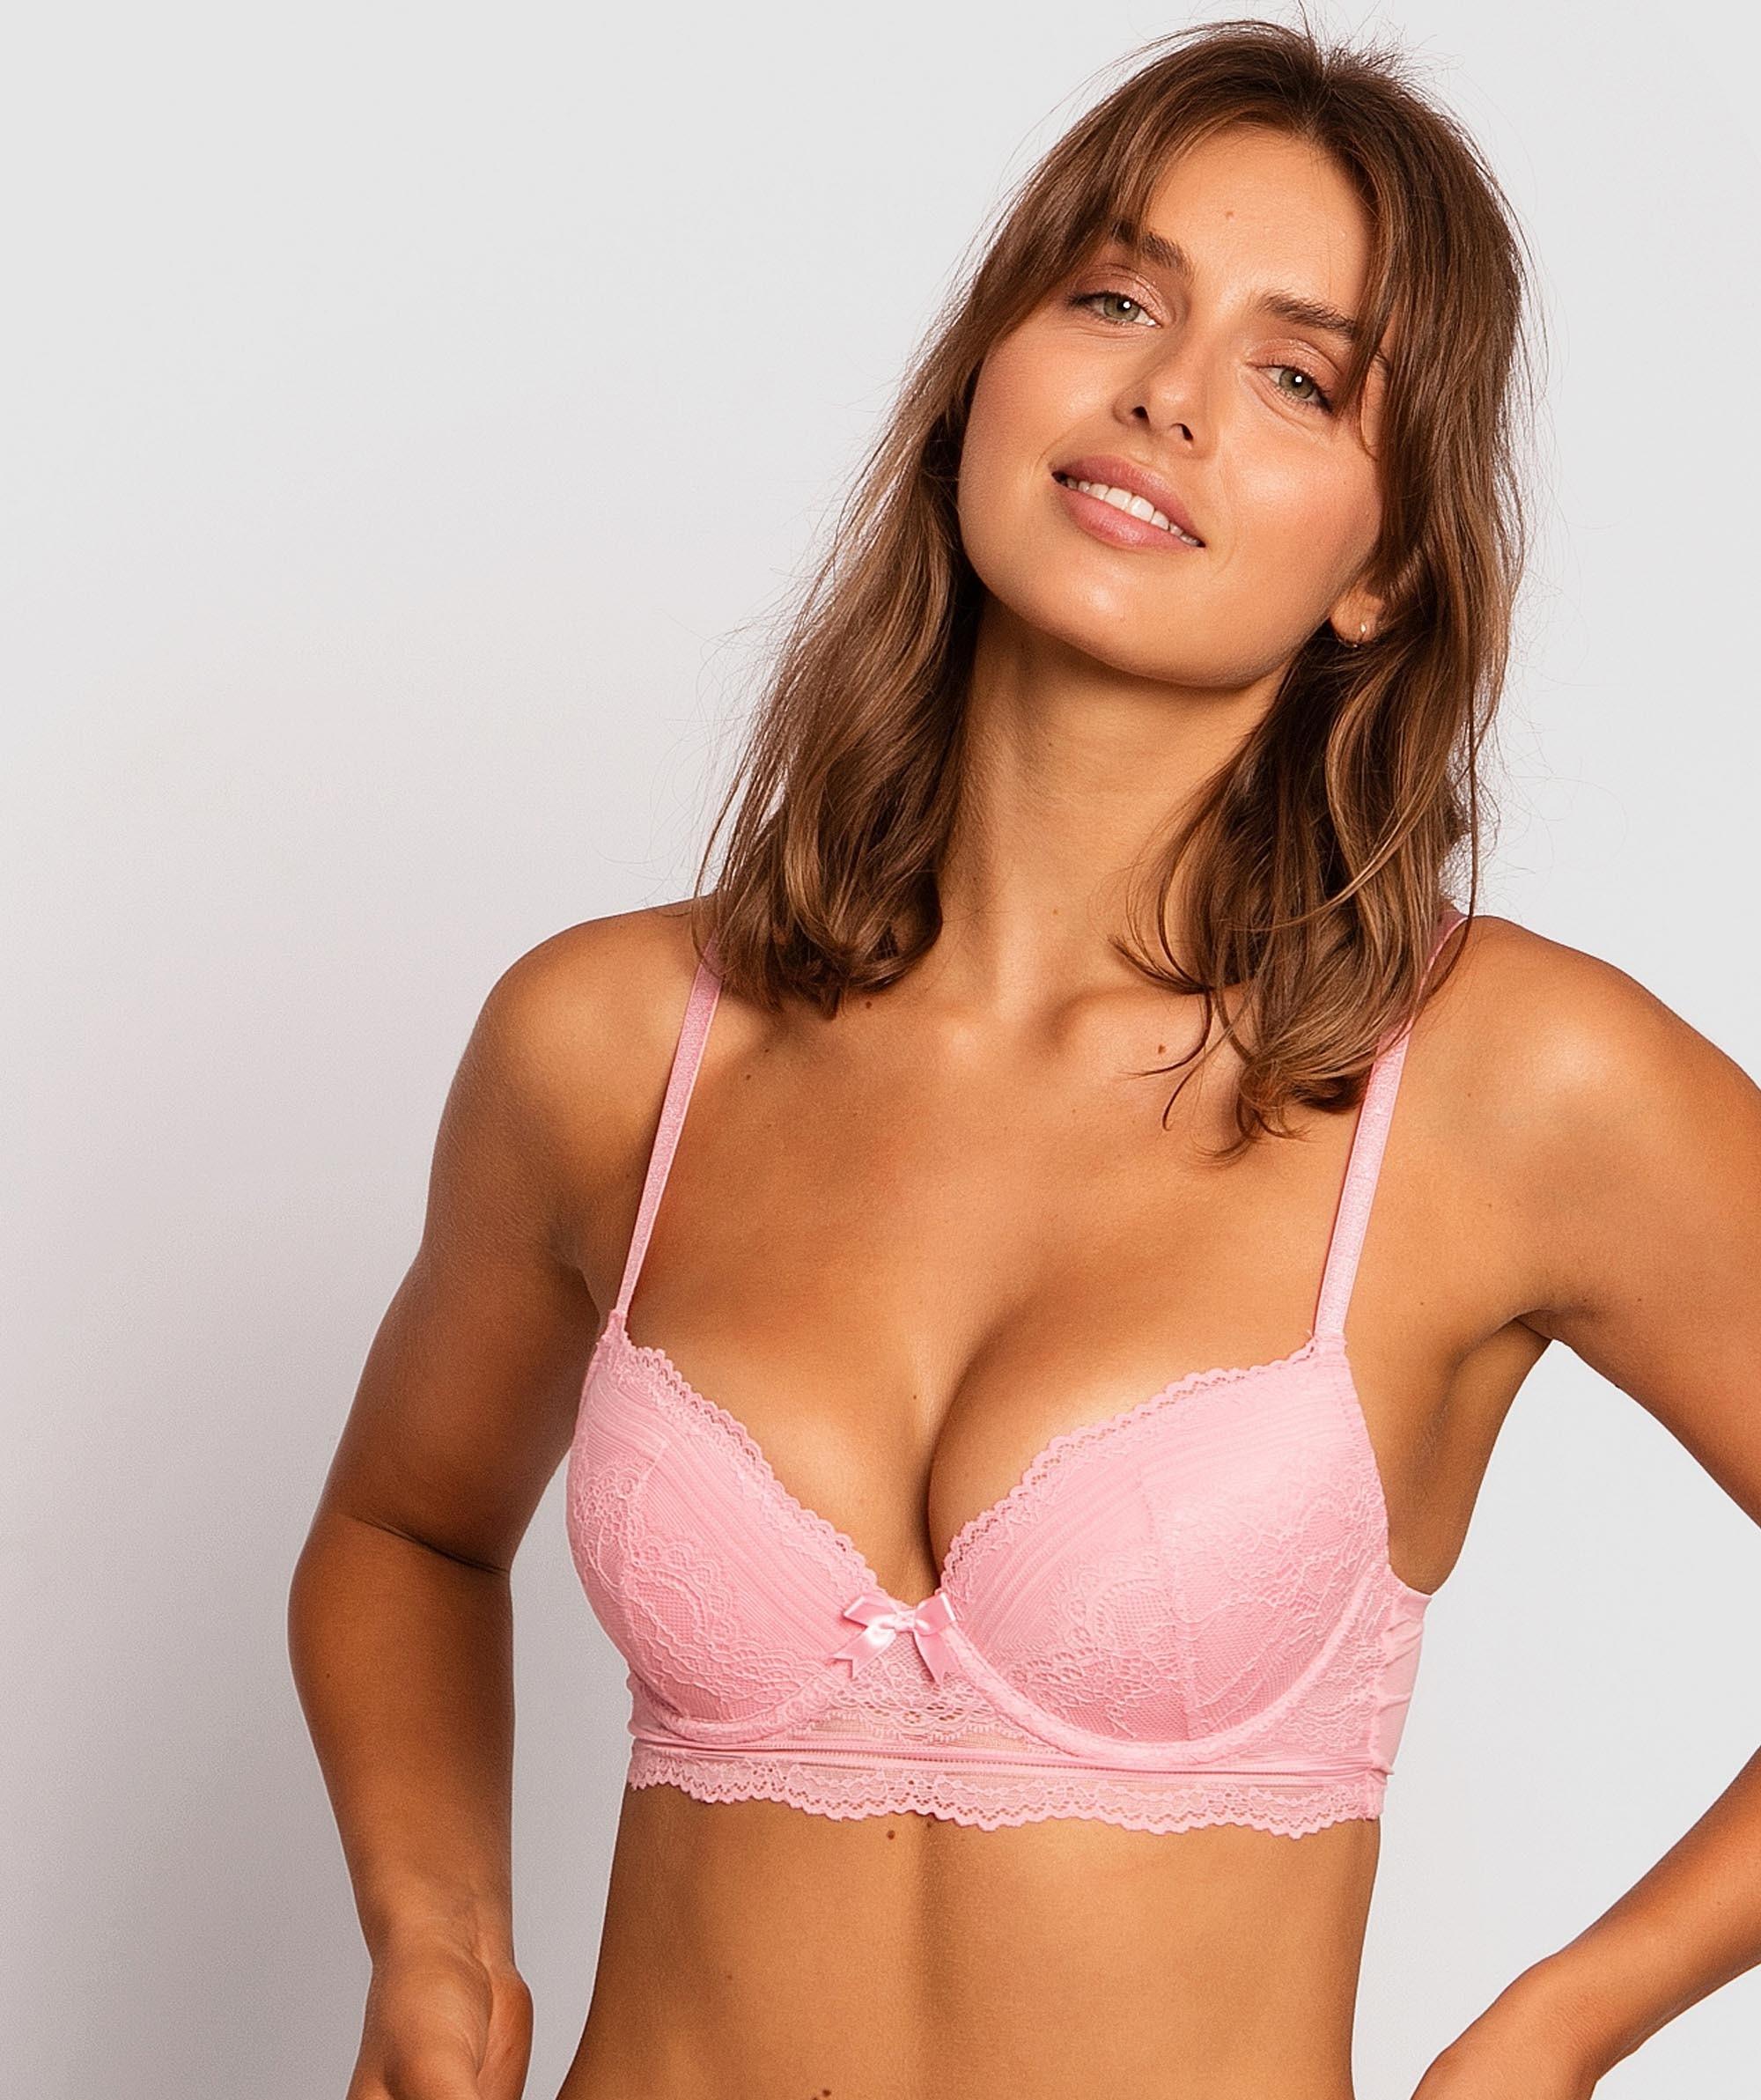 Olivia Push Up Bra - Pink